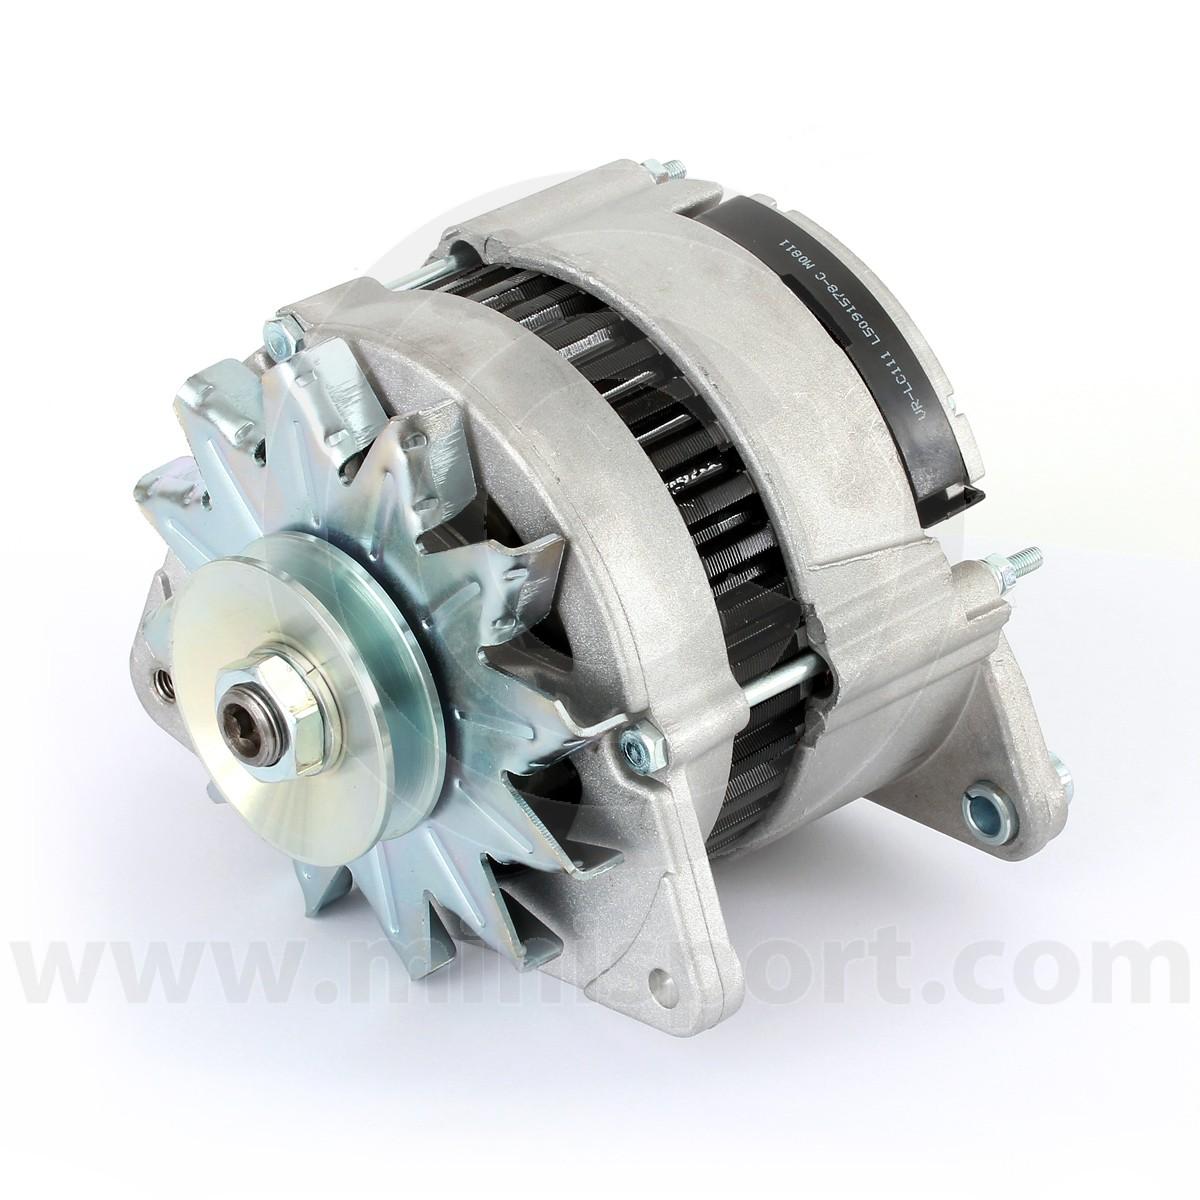 Gxe2276 High Output Alternator Classic Mini Alternators Sport Lucas Wiring Diagram For Mg 70 Amp